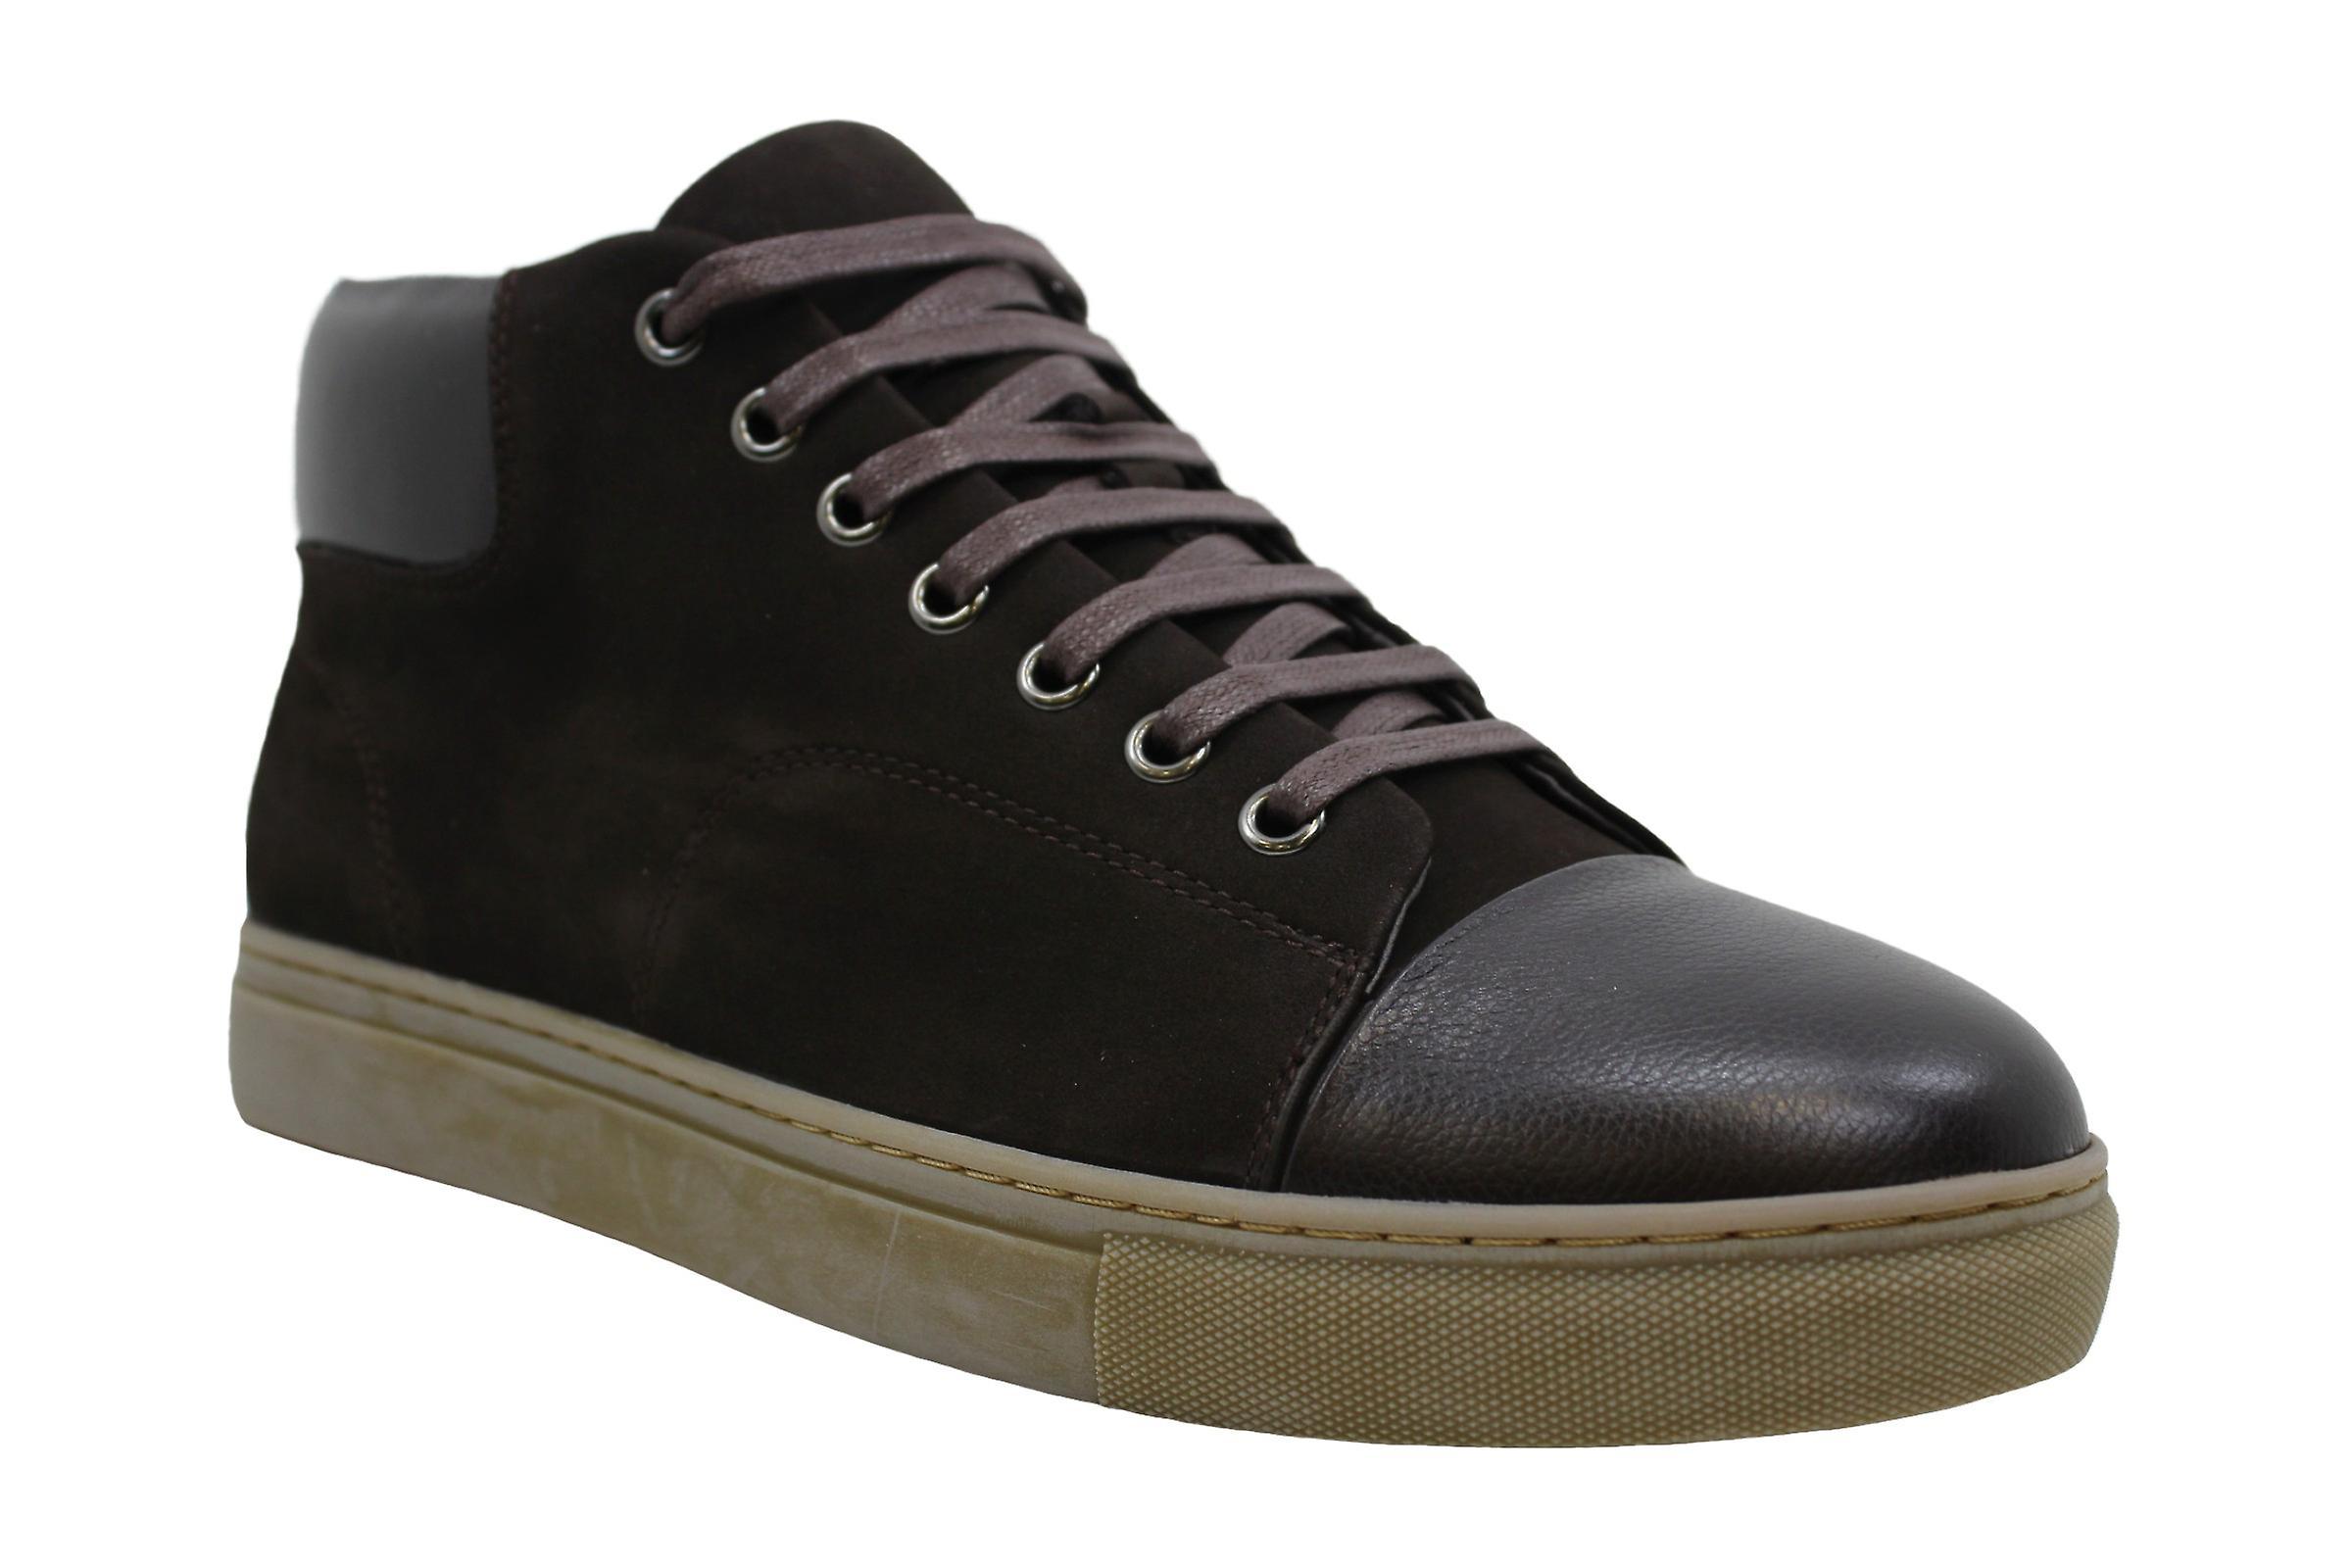 Englische Wäsche Herren Landseer Leder Low Top Lace Up Fashion Sneakers